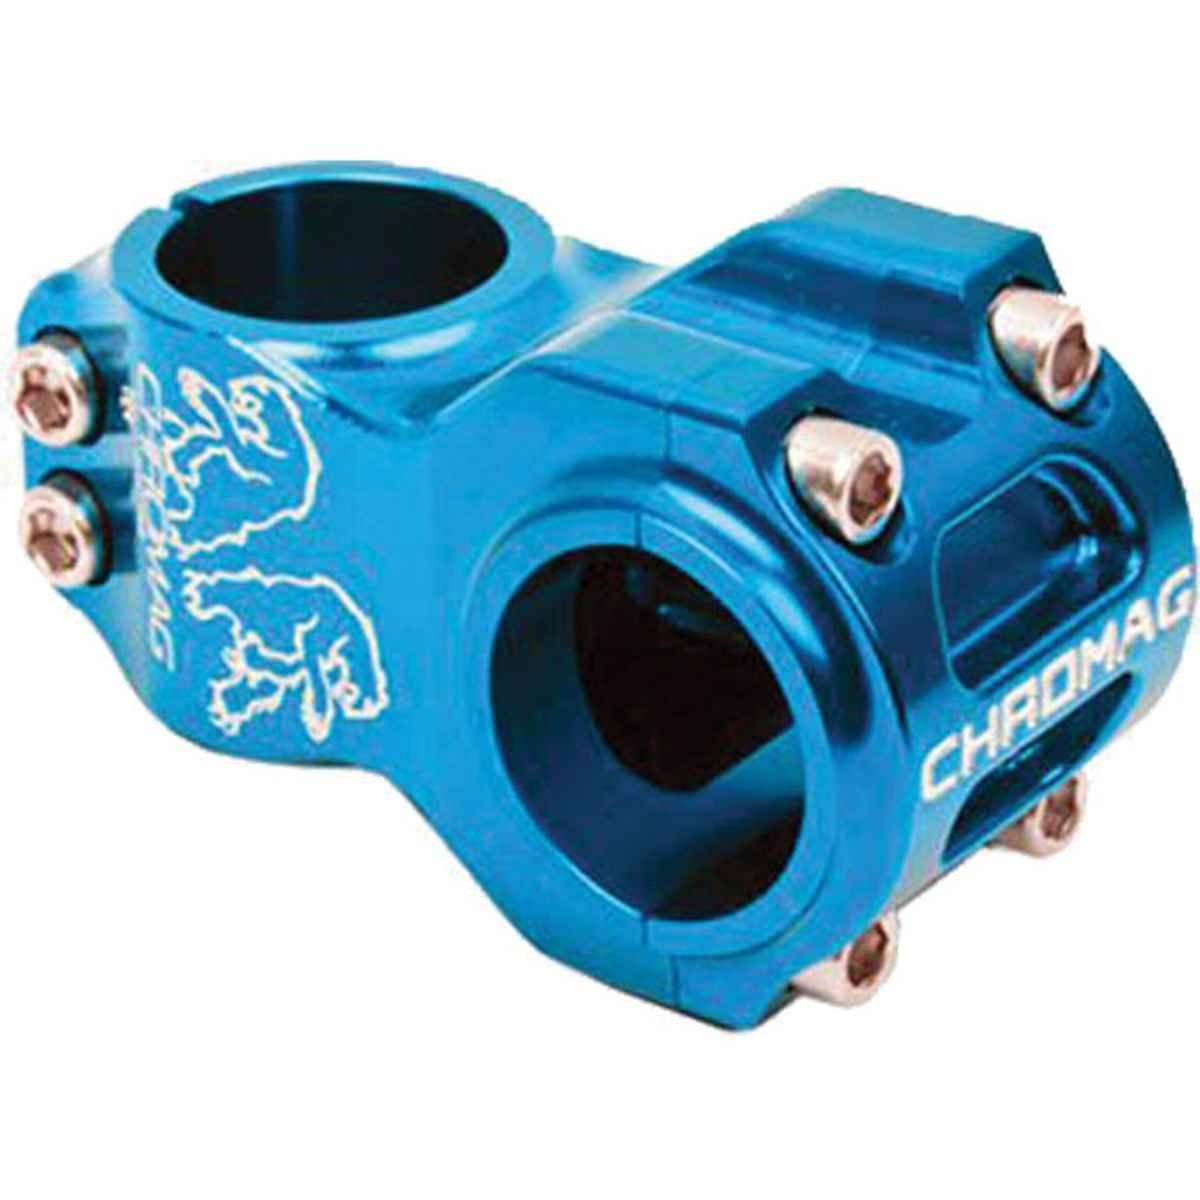 Chromag HiFi v2ステム( 31.8 ) 0d X 50 MM – ブルー – 100 – 012 – 05 B07955B431